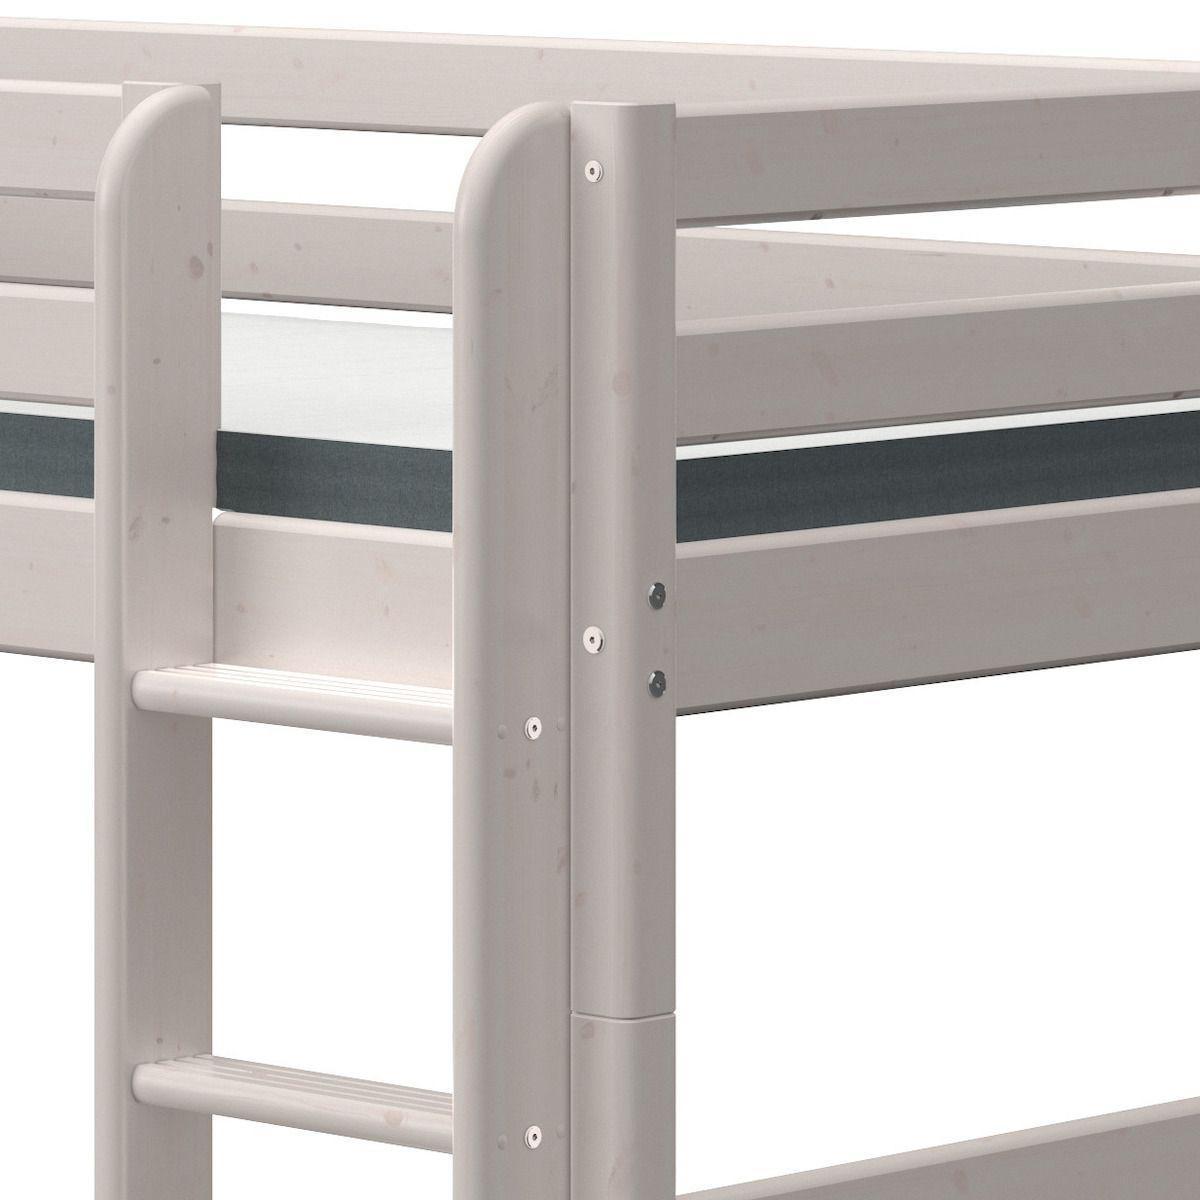 Halbhohes Bett 90x190cm gerade Leiter CLASSIC Flexa grey washed